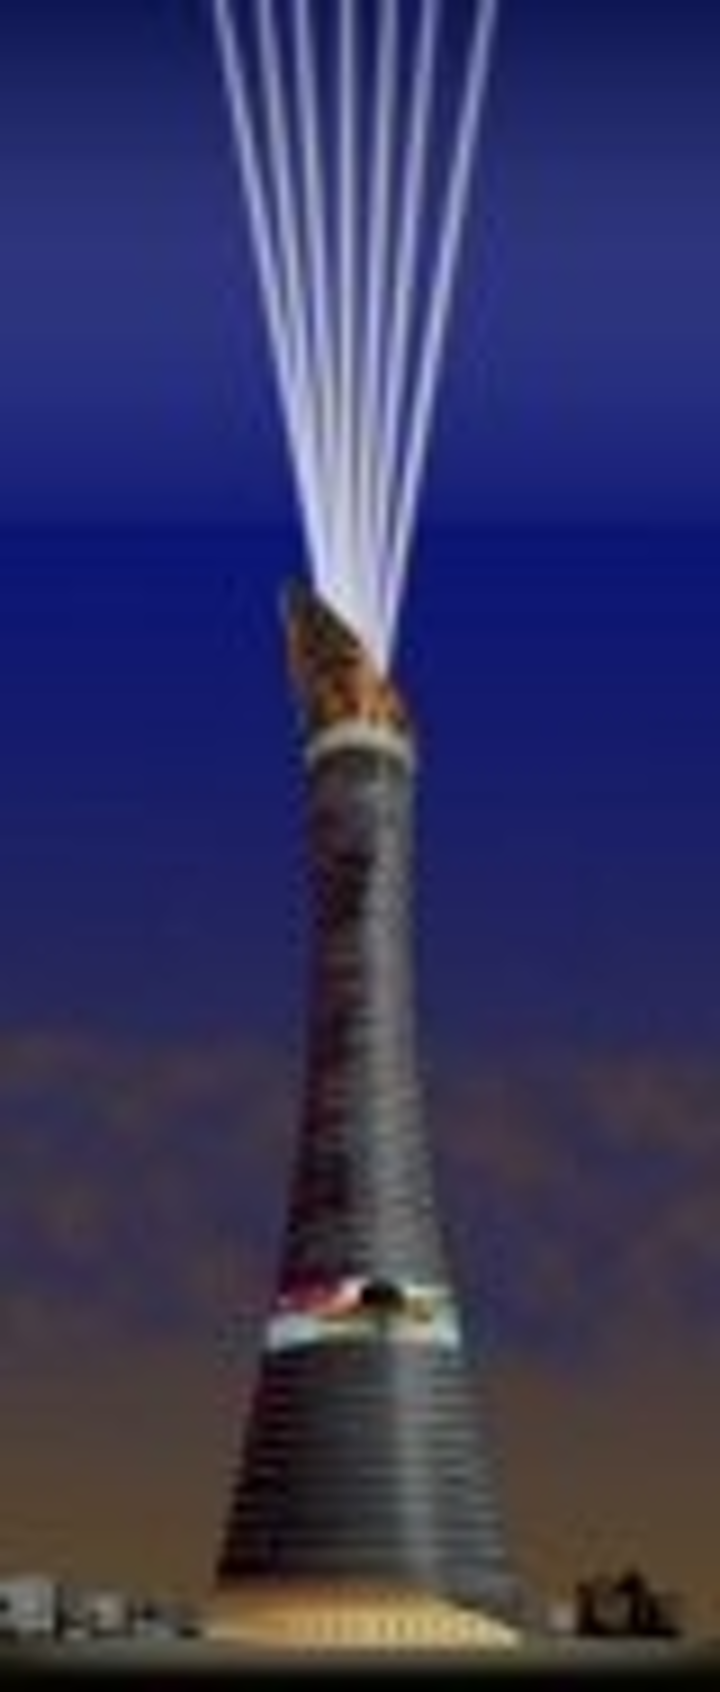 Content Dam Leds En Articles 2006 07 Ksld Unveils Led Lighting Skin For Qatar Tower Leftcolumn Article Thumbnailimage File